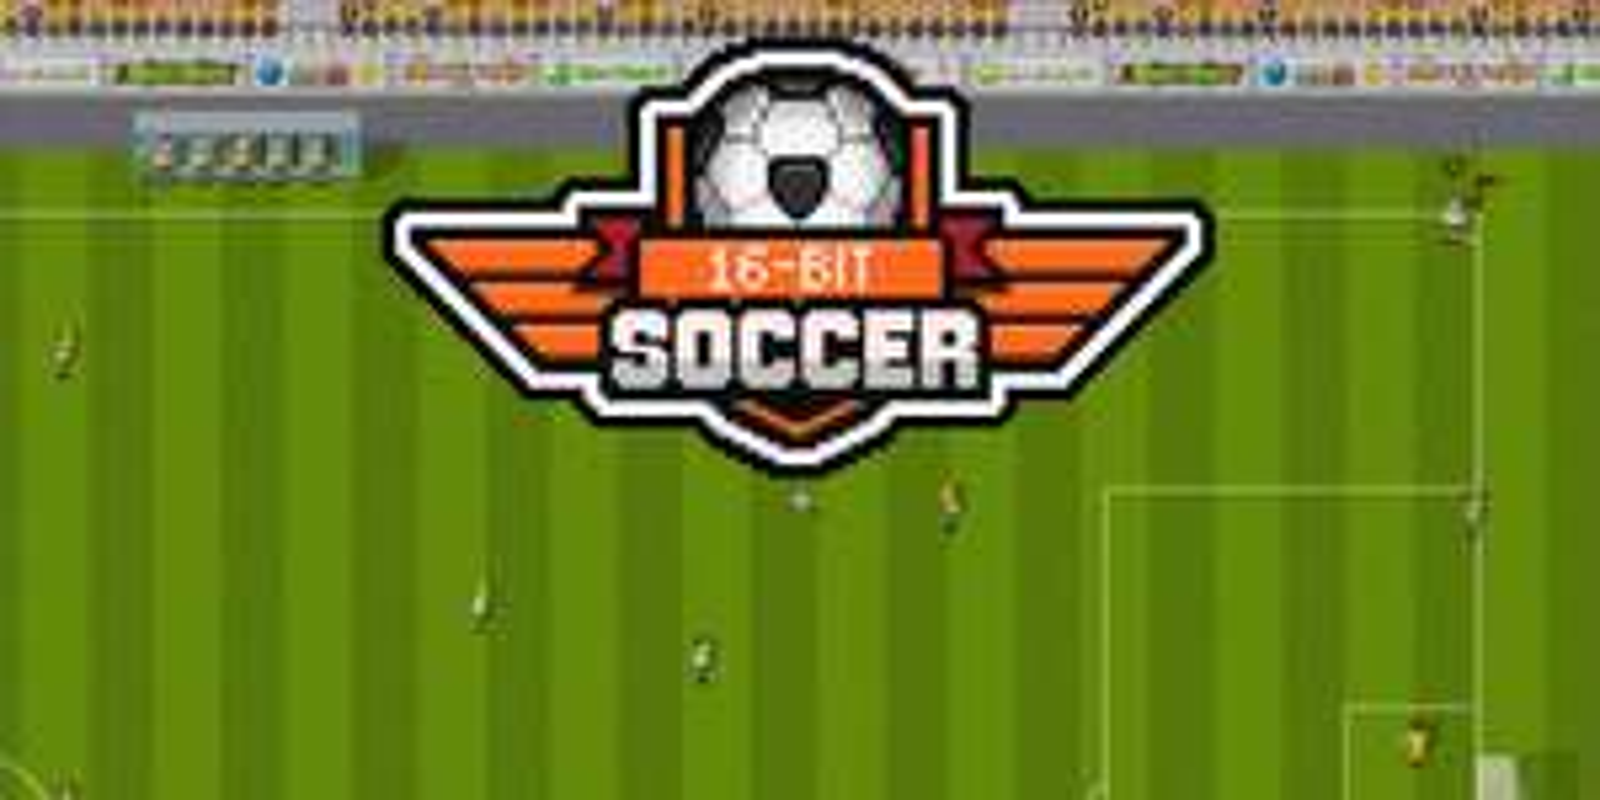 16-Bit Soccer £0.89 @ Nintendo eShop